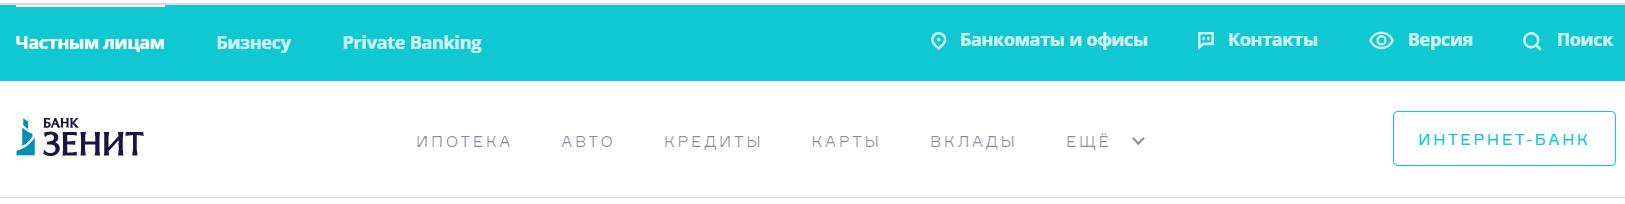 Зенит Онлайн Банк